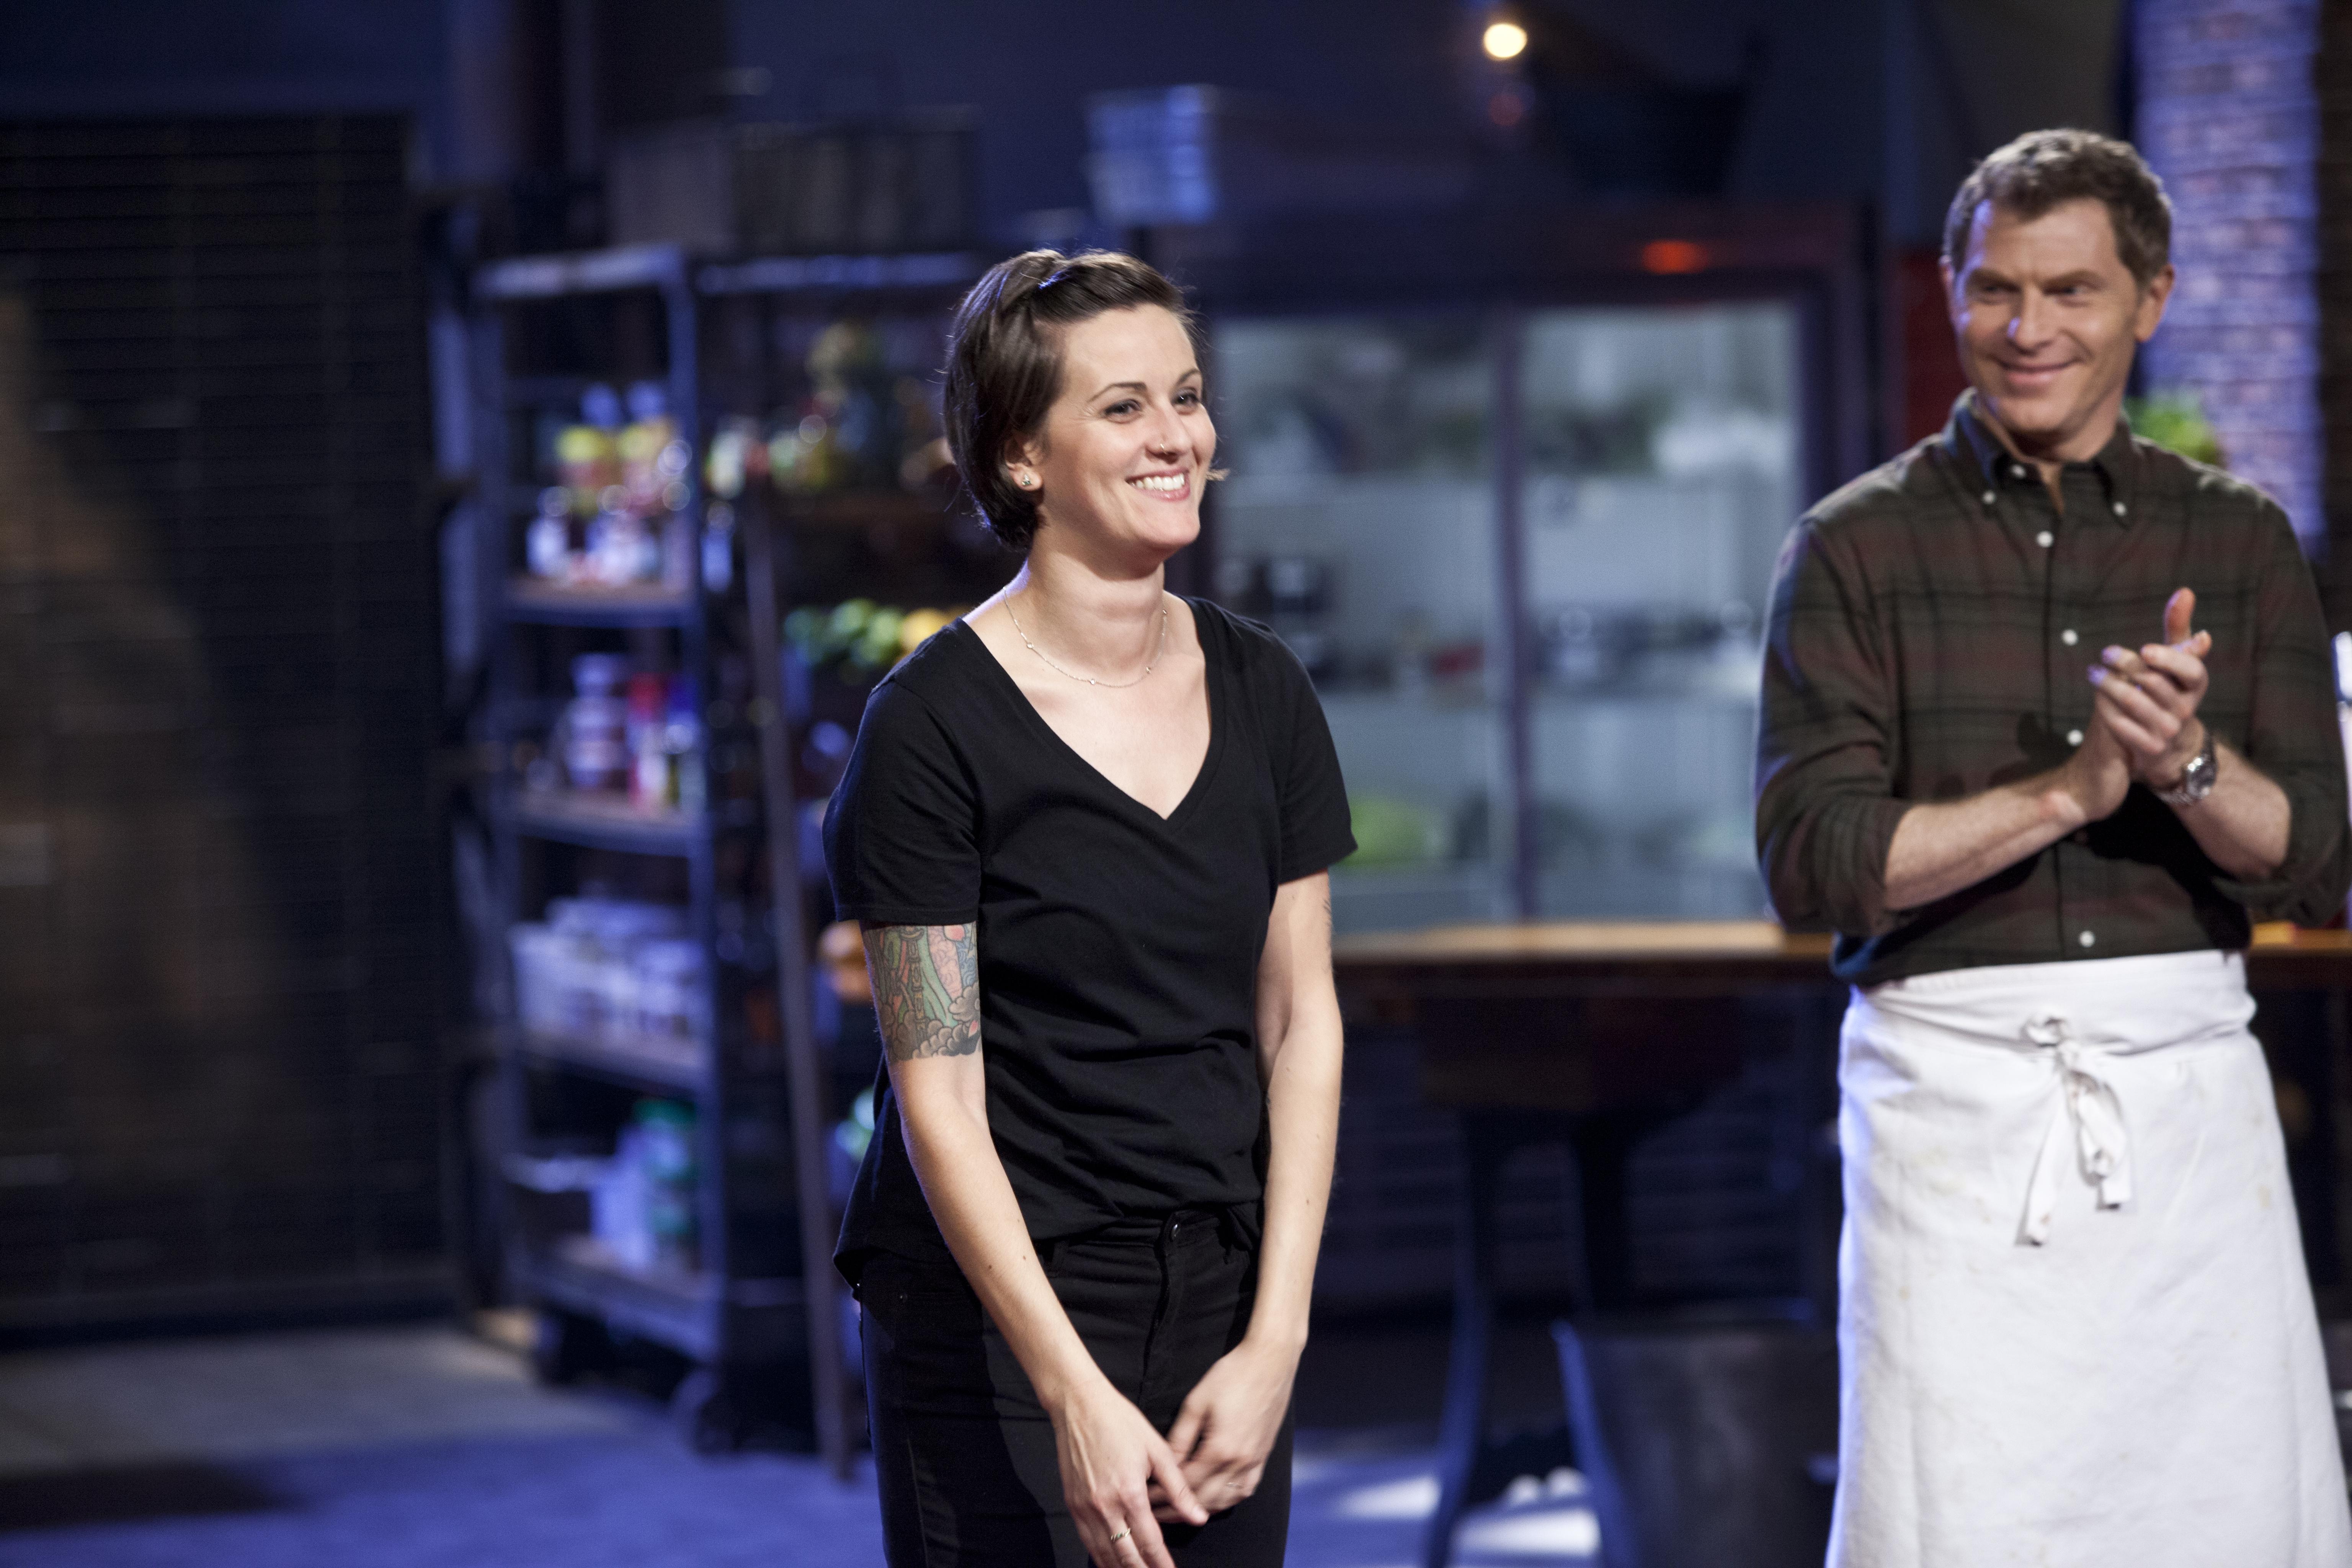 Austin Chef Amanda Rockman Triumphed Over Bobby Flay